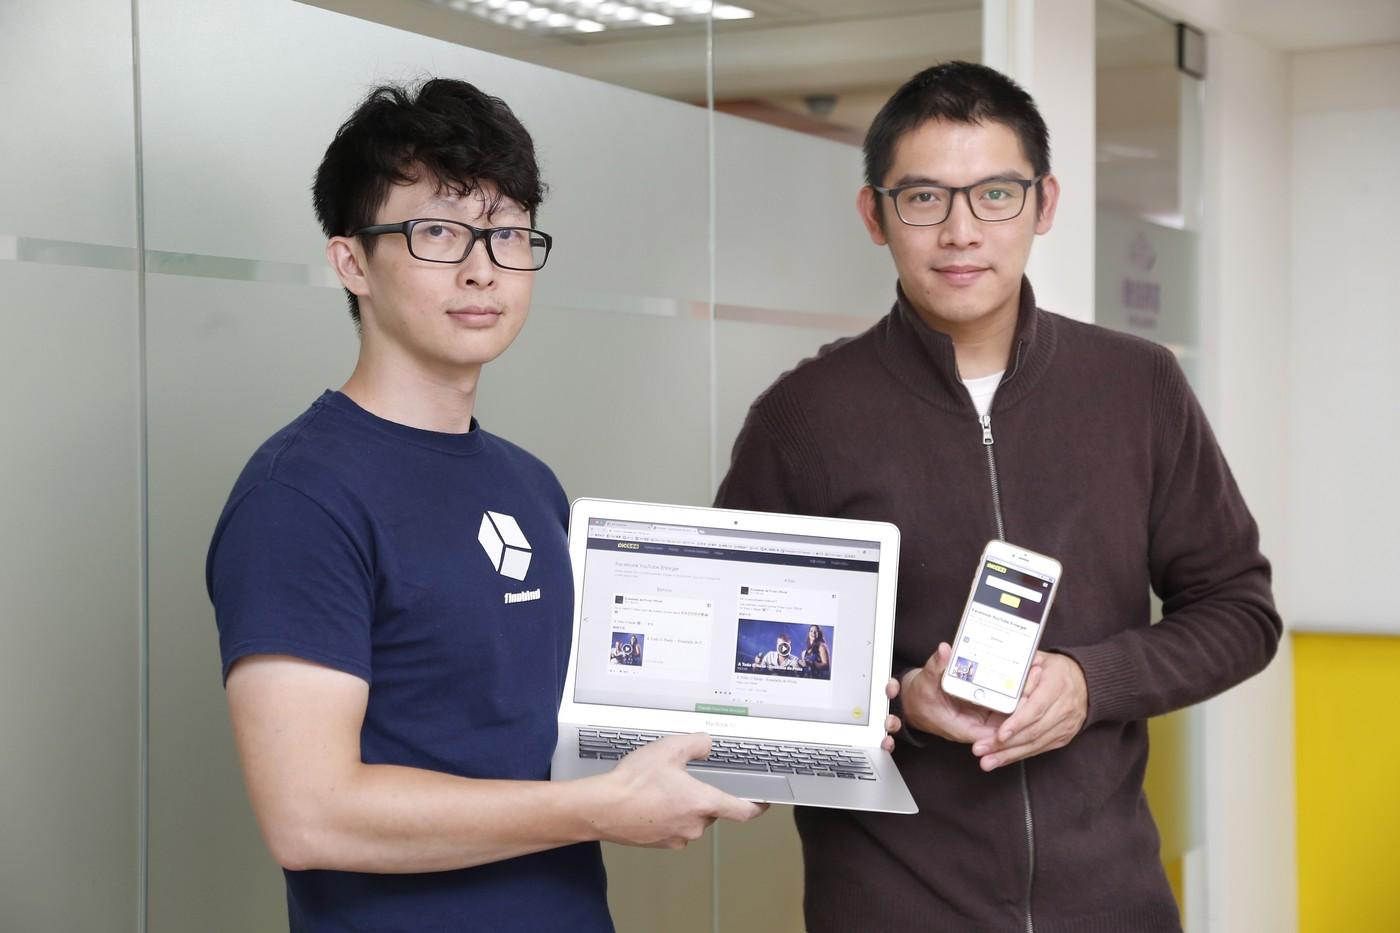 [Meet創業之星] 社群經營利器!PicSee首創客製化分享畫面及標題